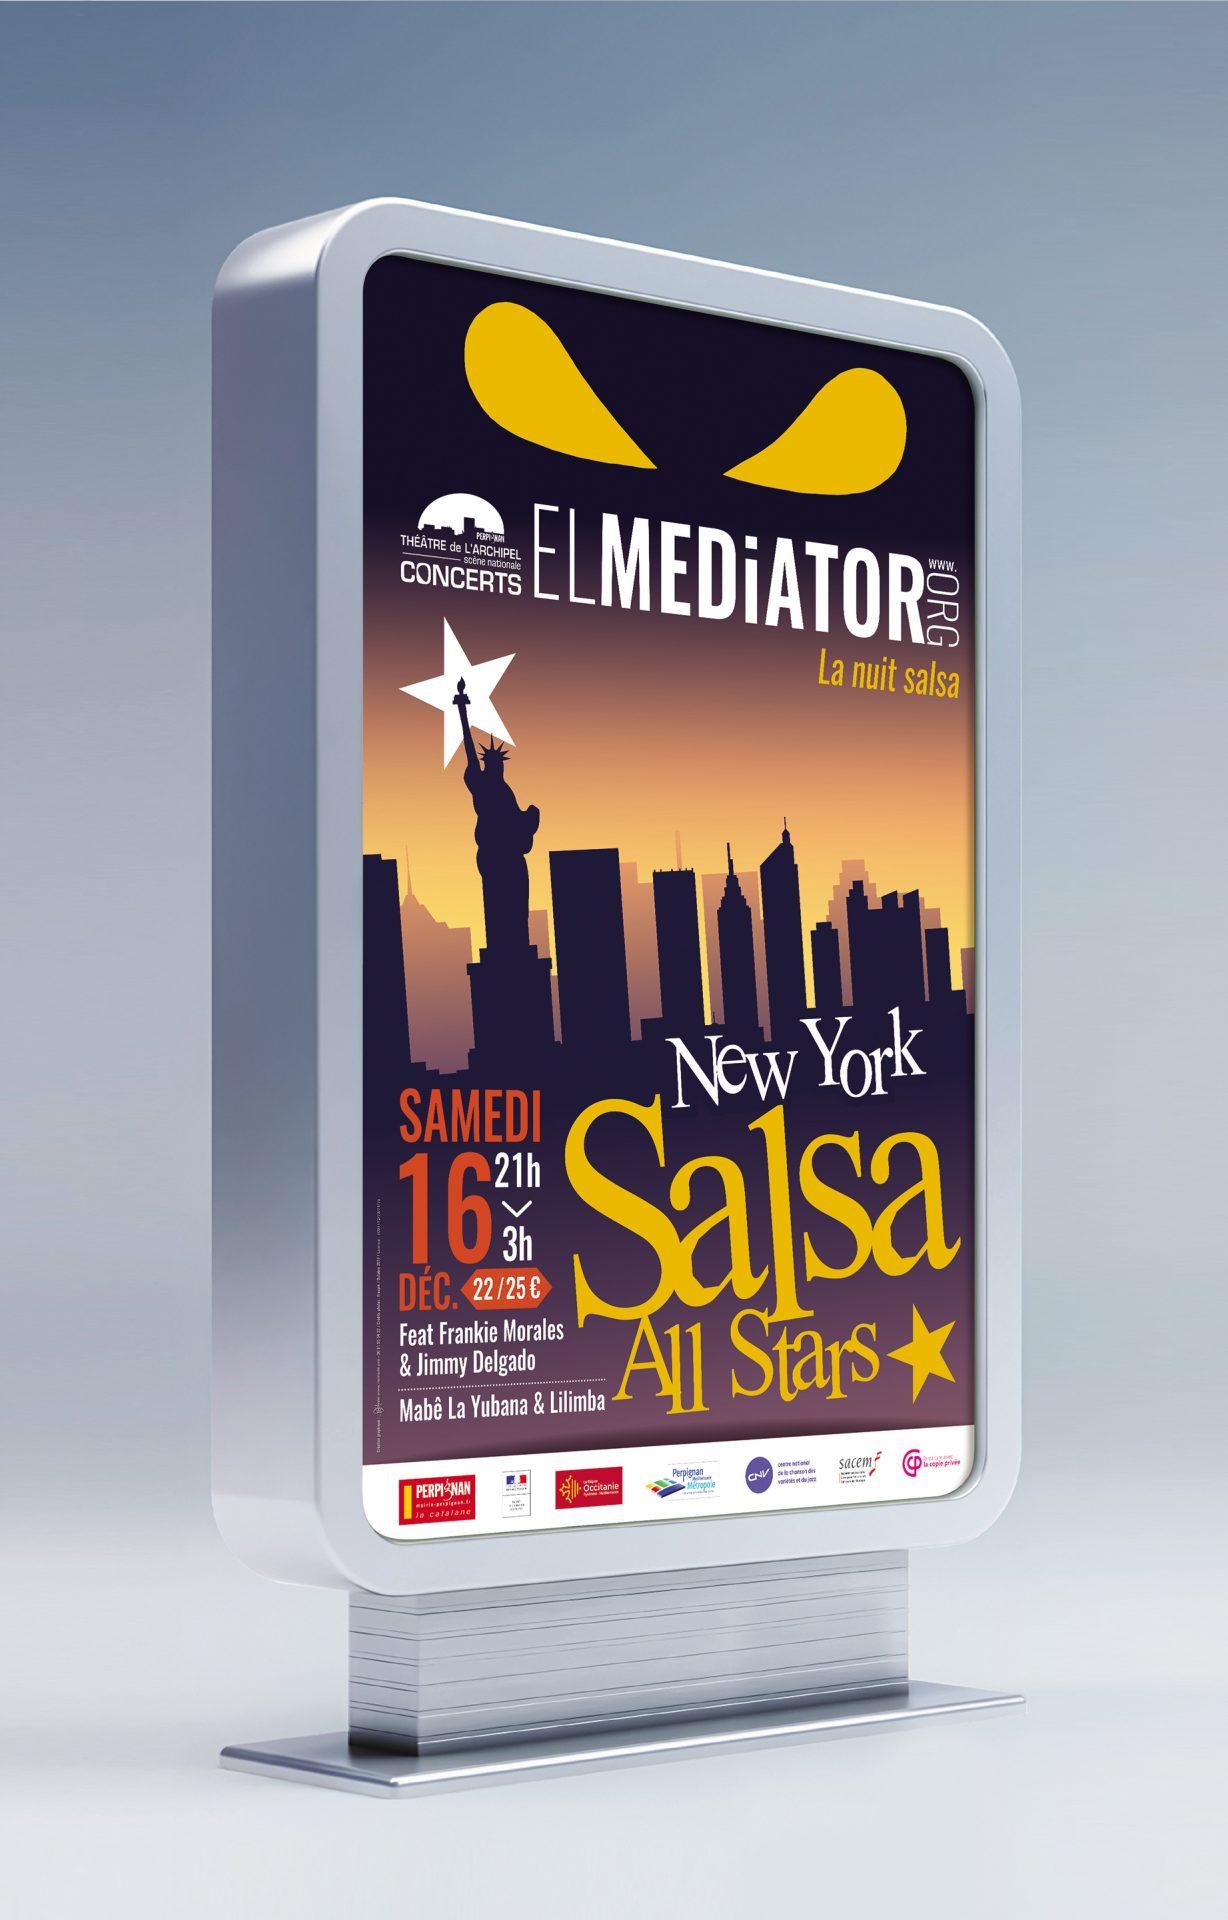 image-elmediator-nuit-salsa-72dpi.jpg